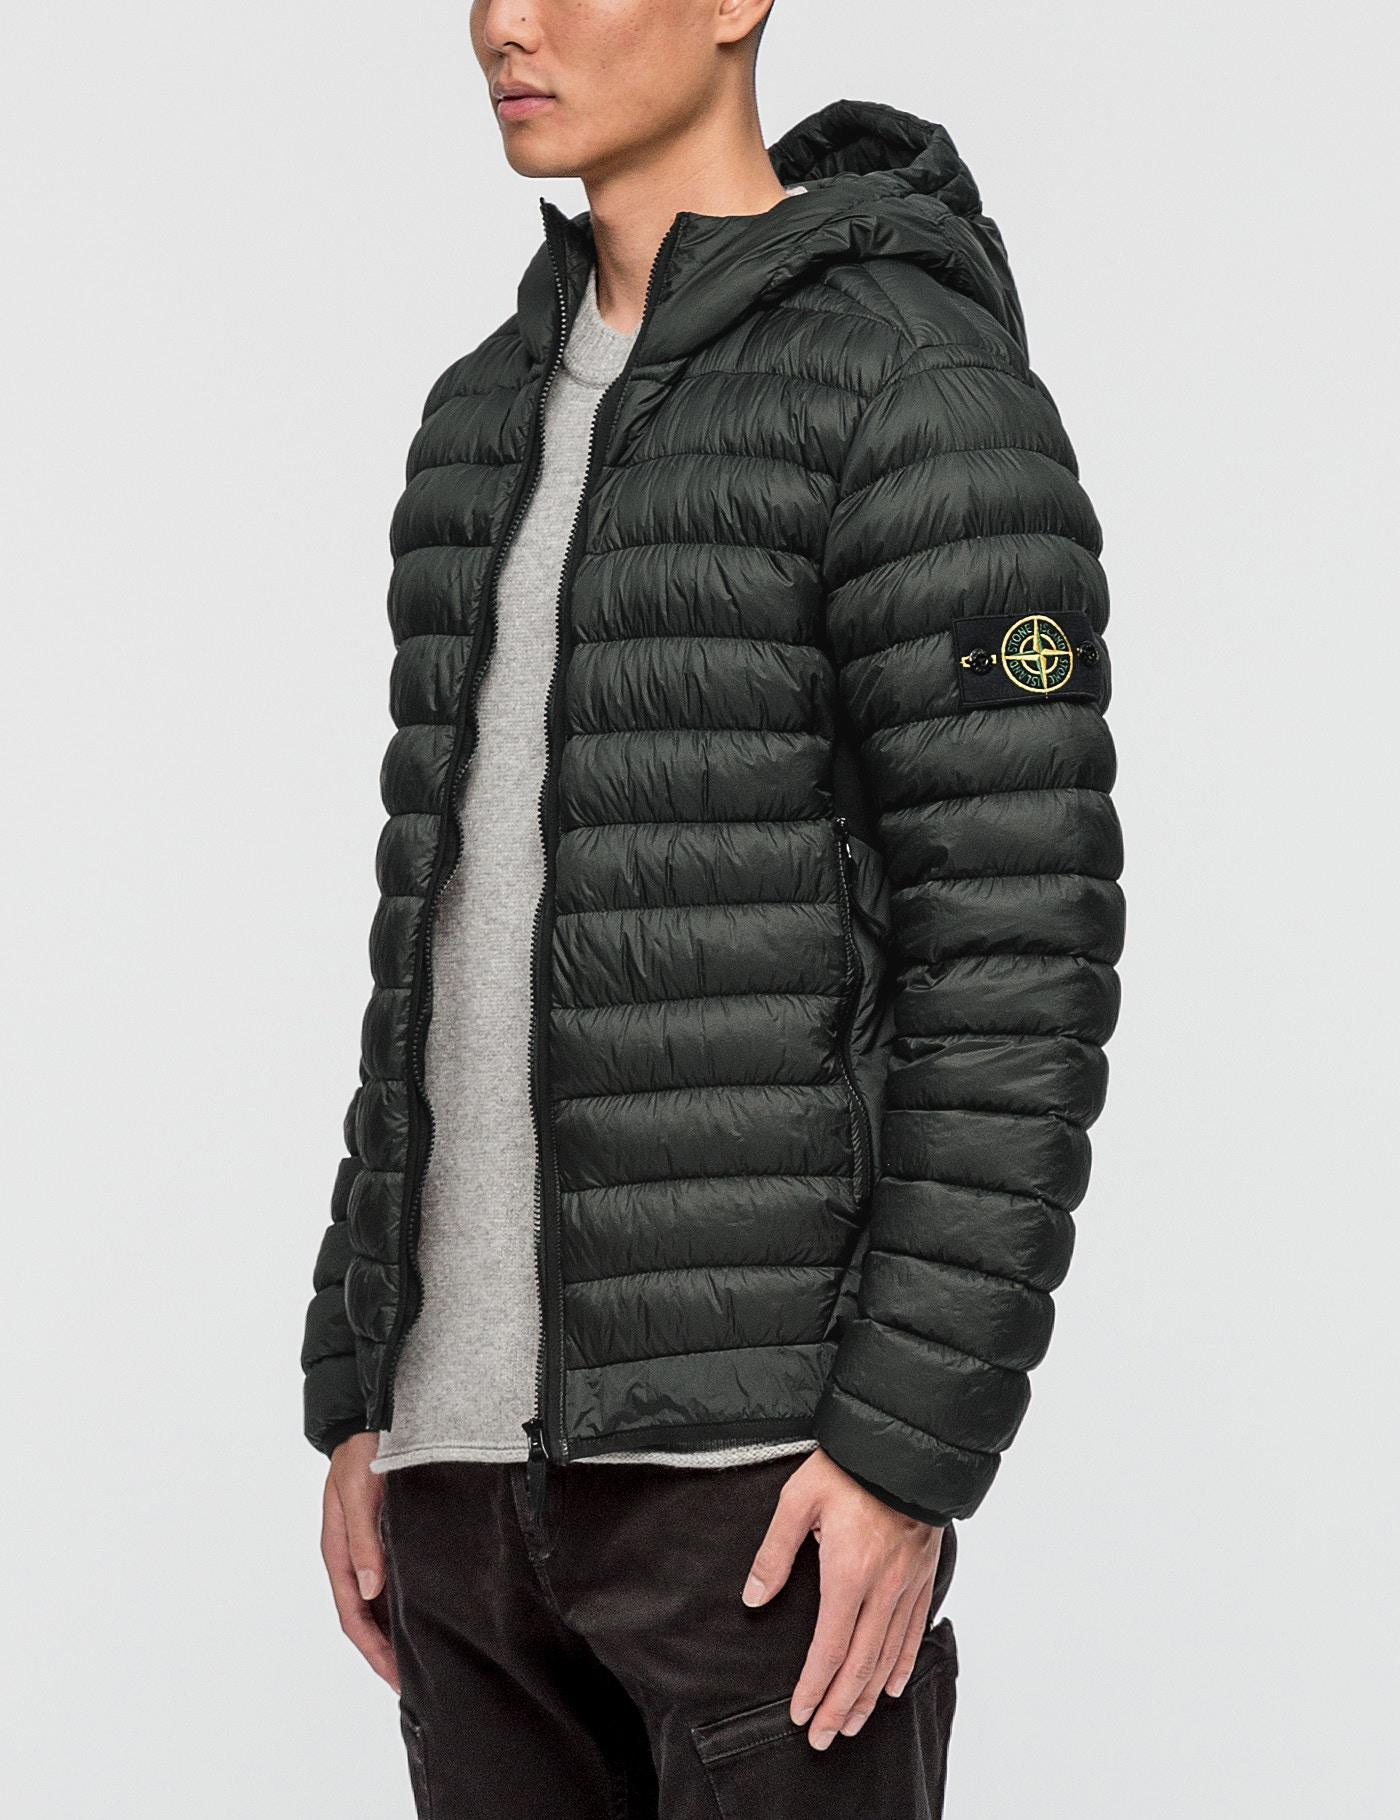 cb8fe8c0e4b48 Lyst - Stone Island Garment Dyed Micro Yarn Hooded Down Jacket in ...